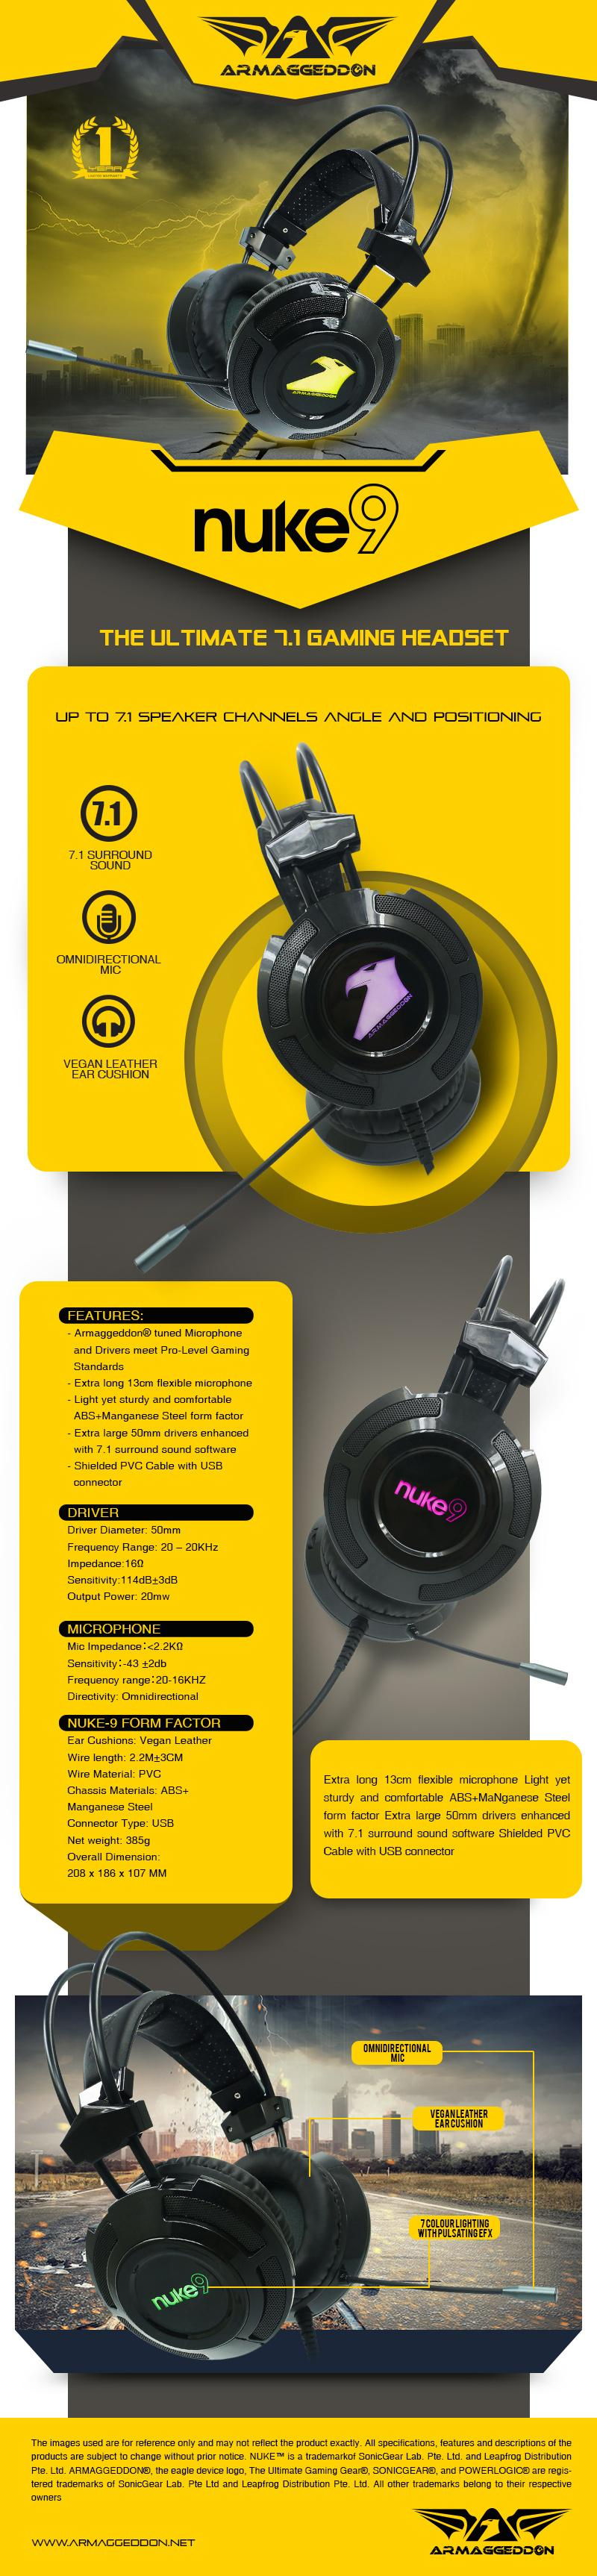 eDM-Nuke-9-3D-Version NEW.jpg